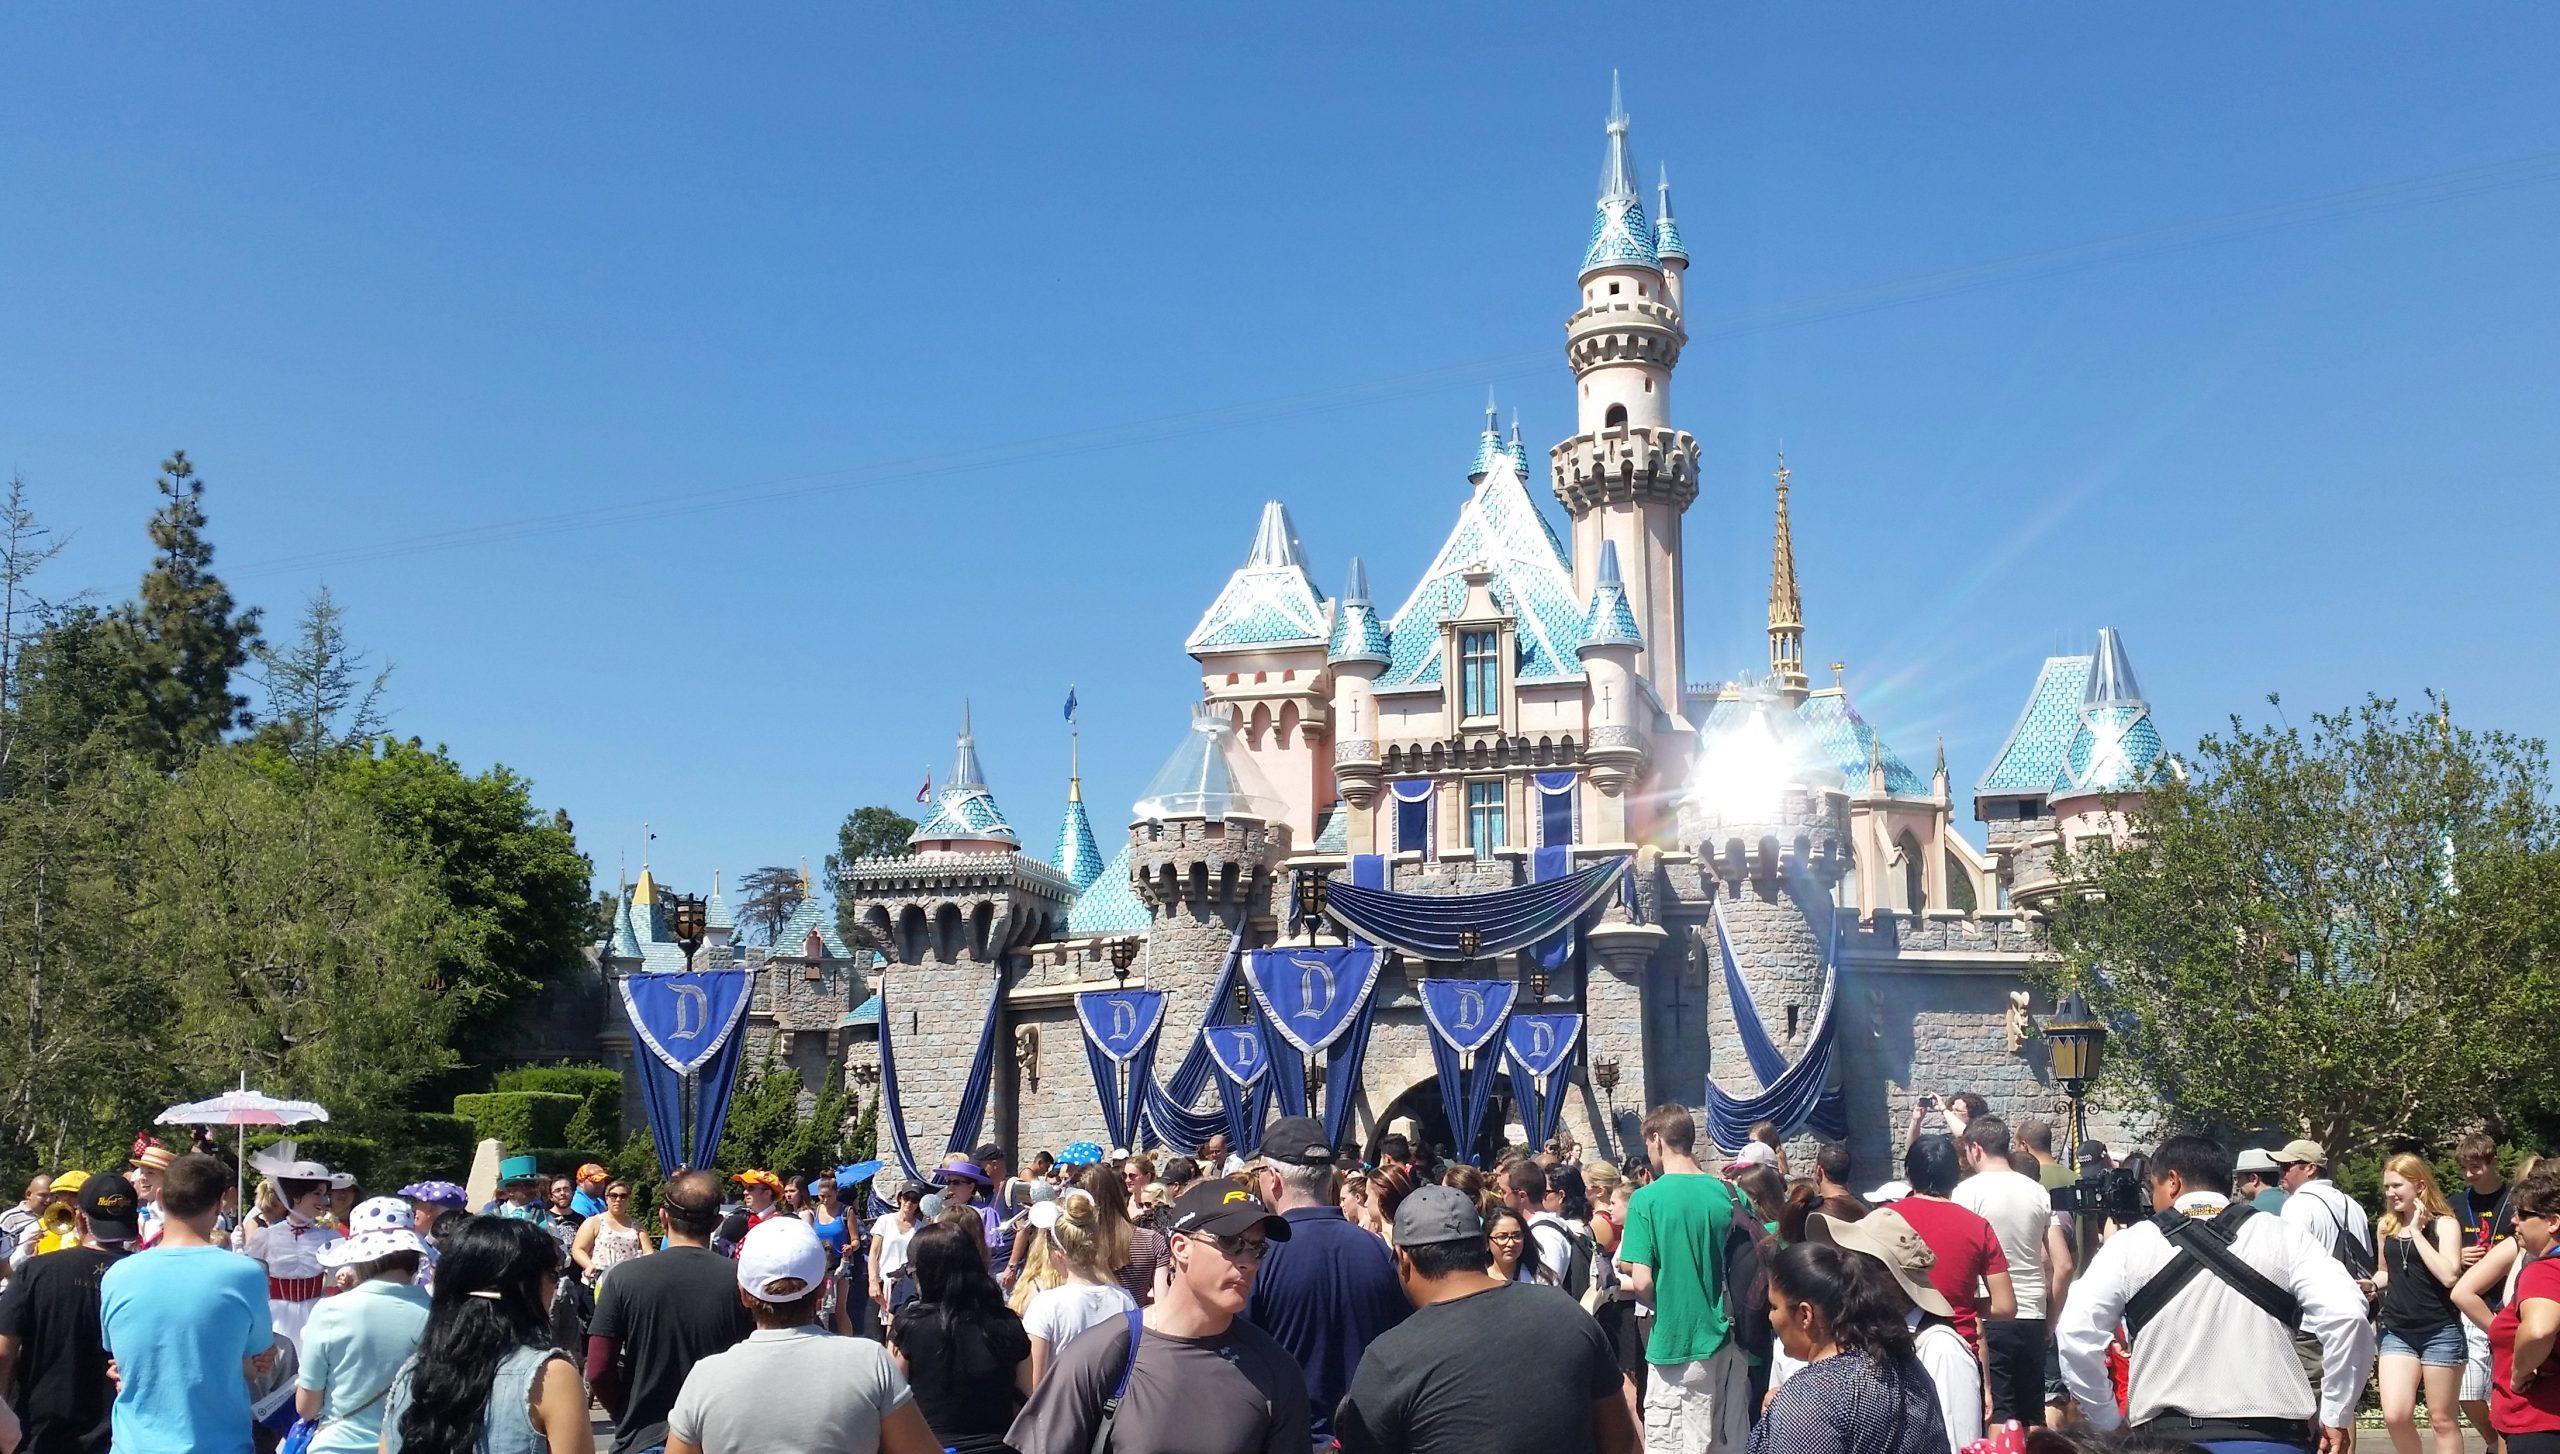 vacation things to do amusement park theme disneyland castle fun travel blog